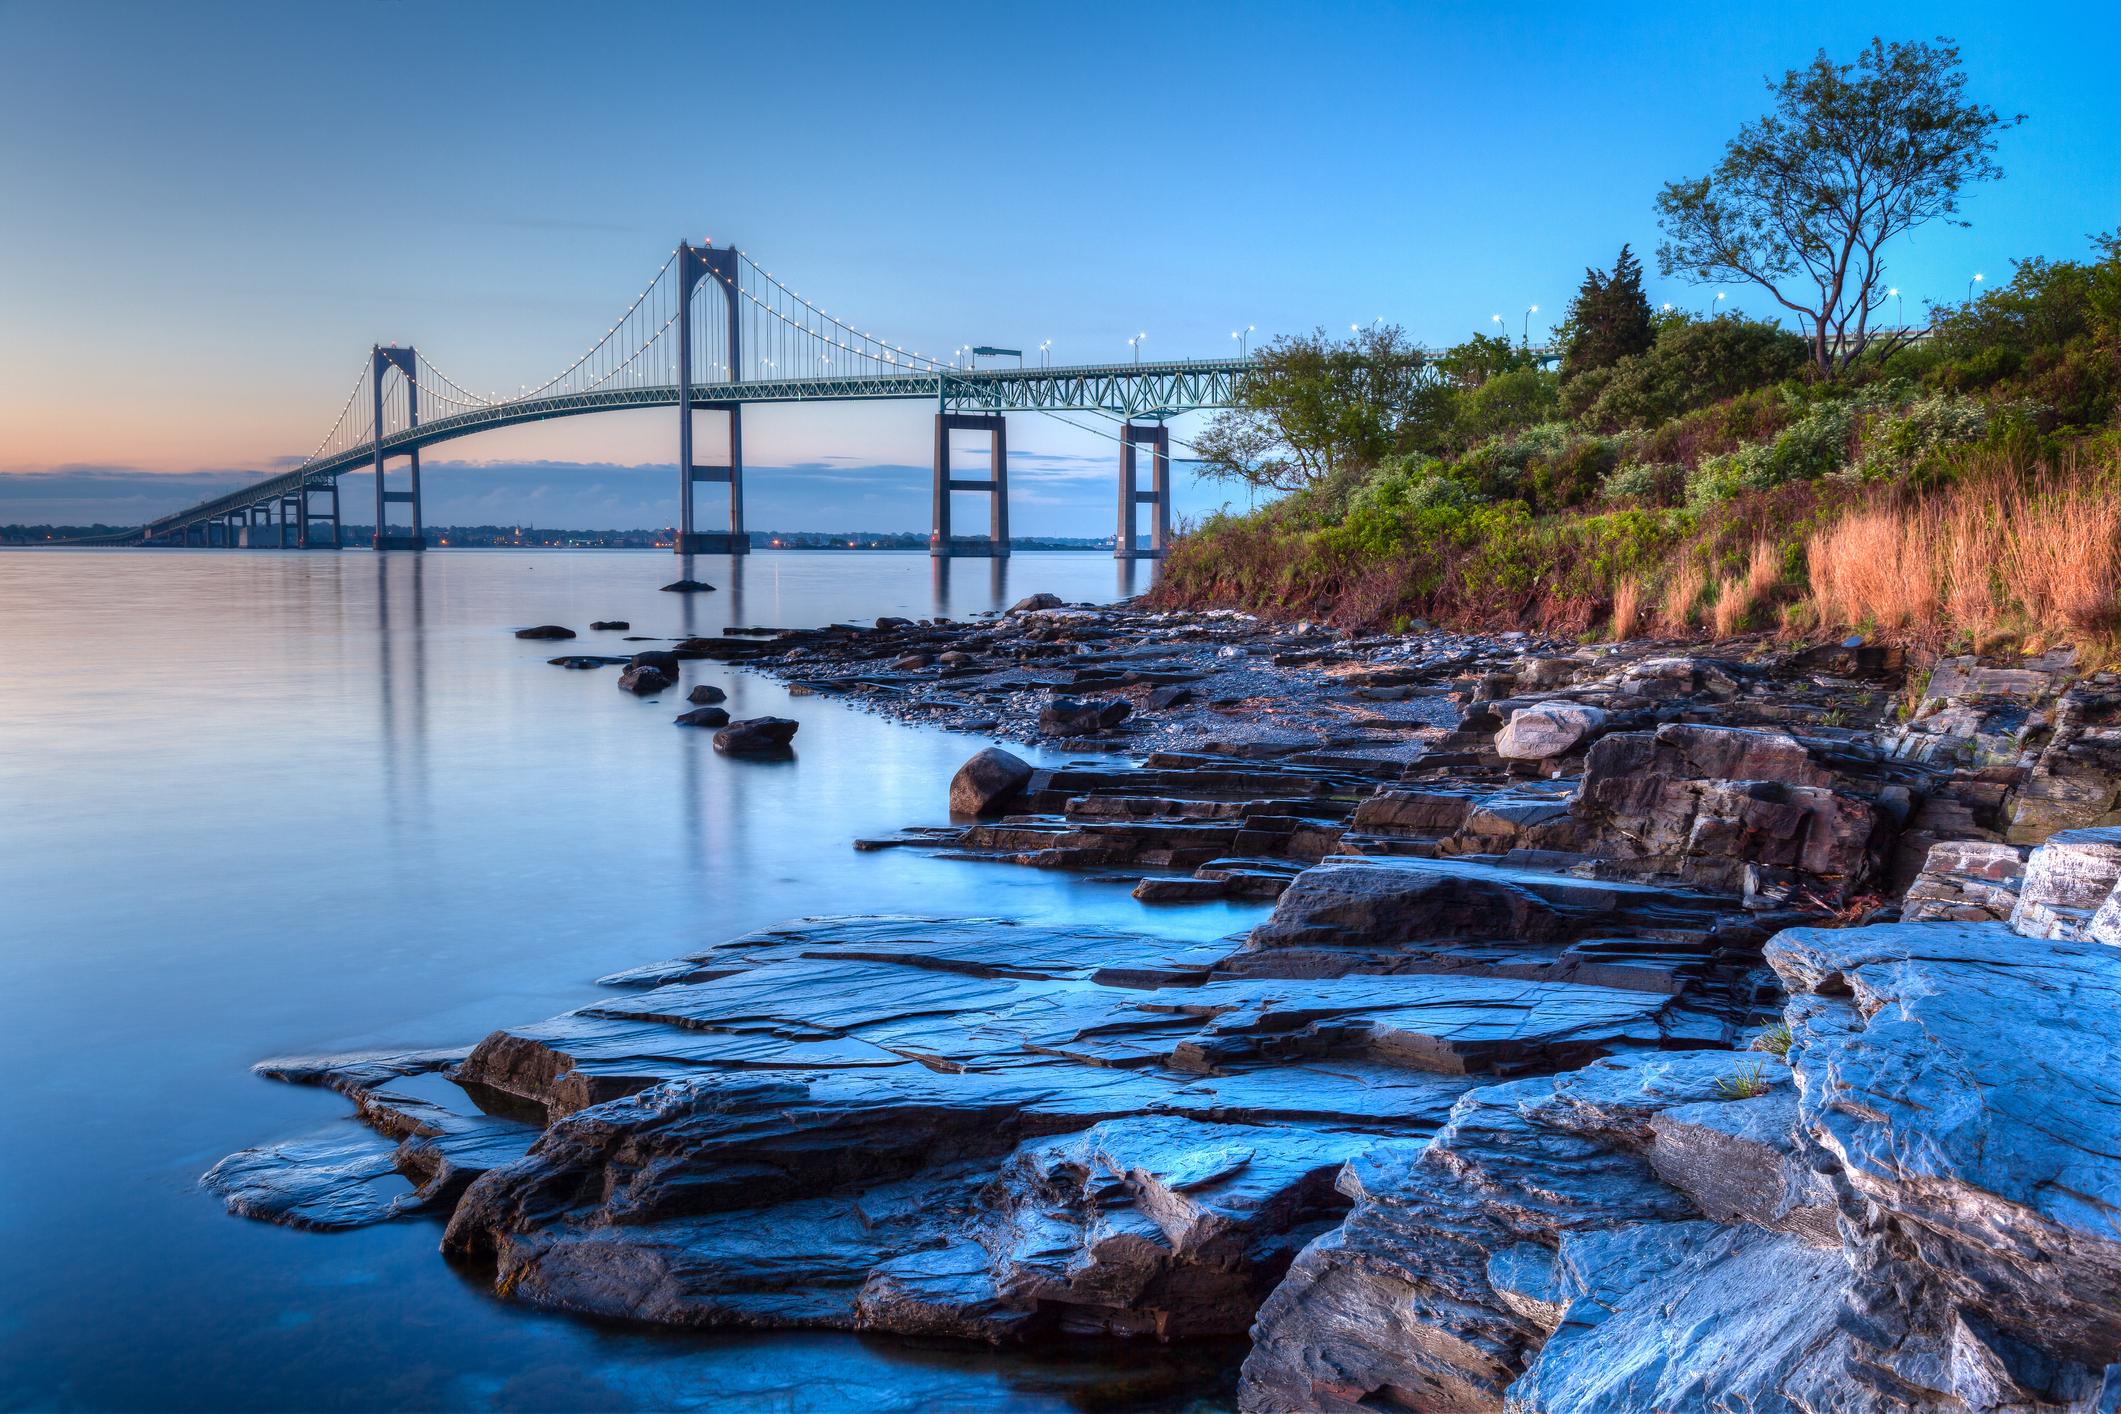 Newport Sunrise Photo by mcdonojj/iStock/Getty Images